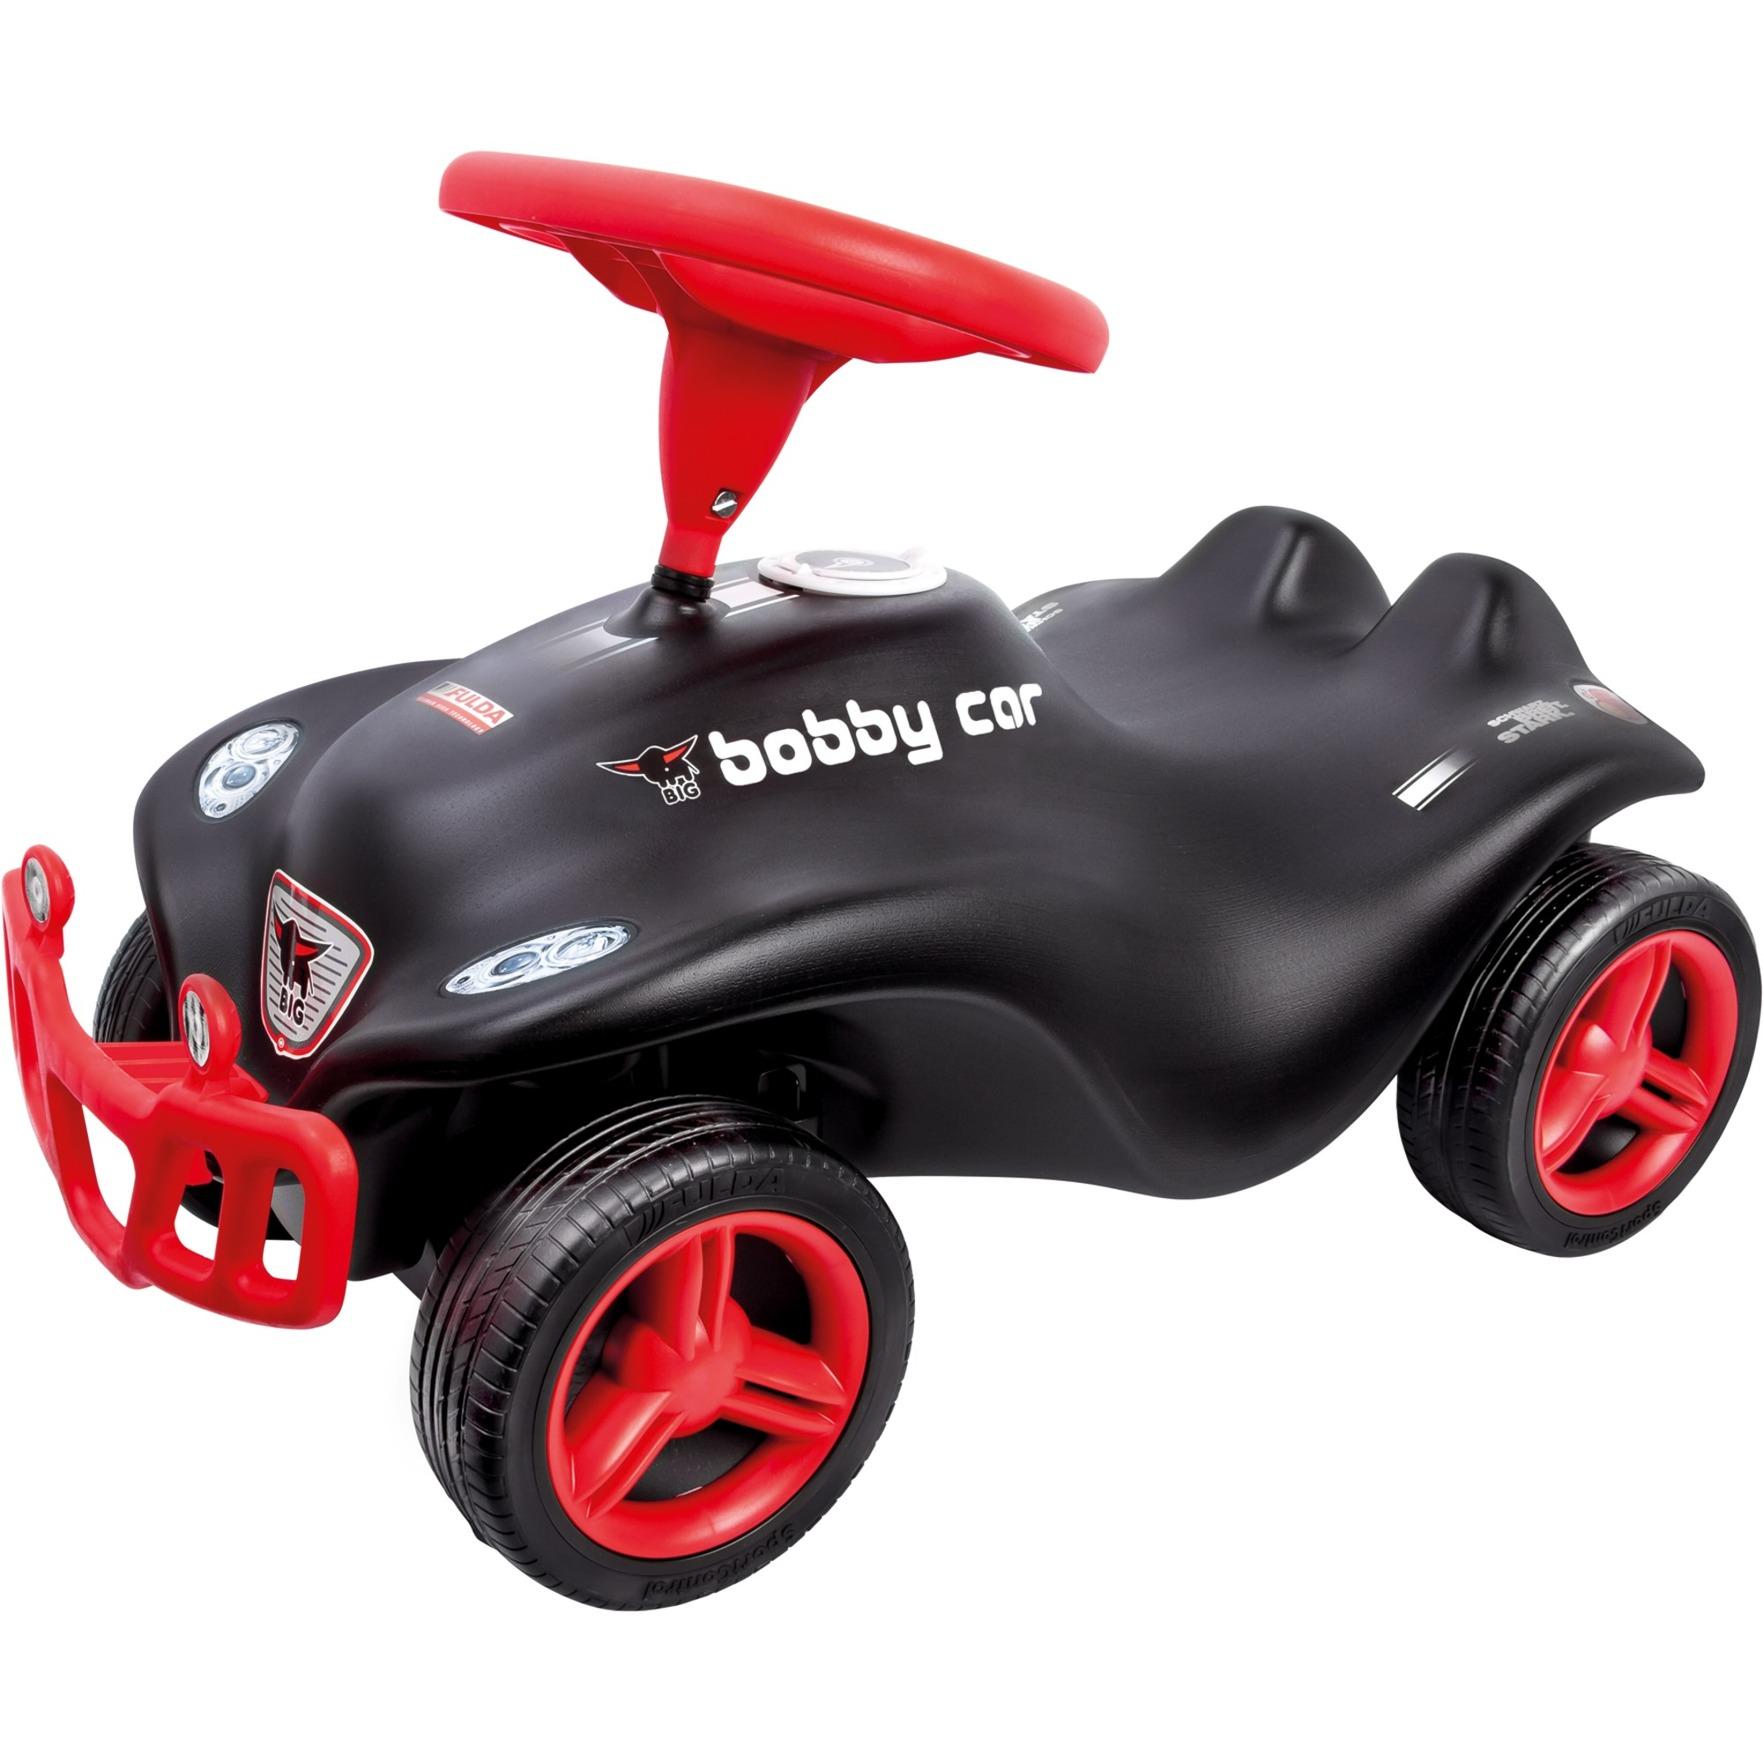 800056163 Negro, Rojo juguete de arrastre, Automóvil de juguete